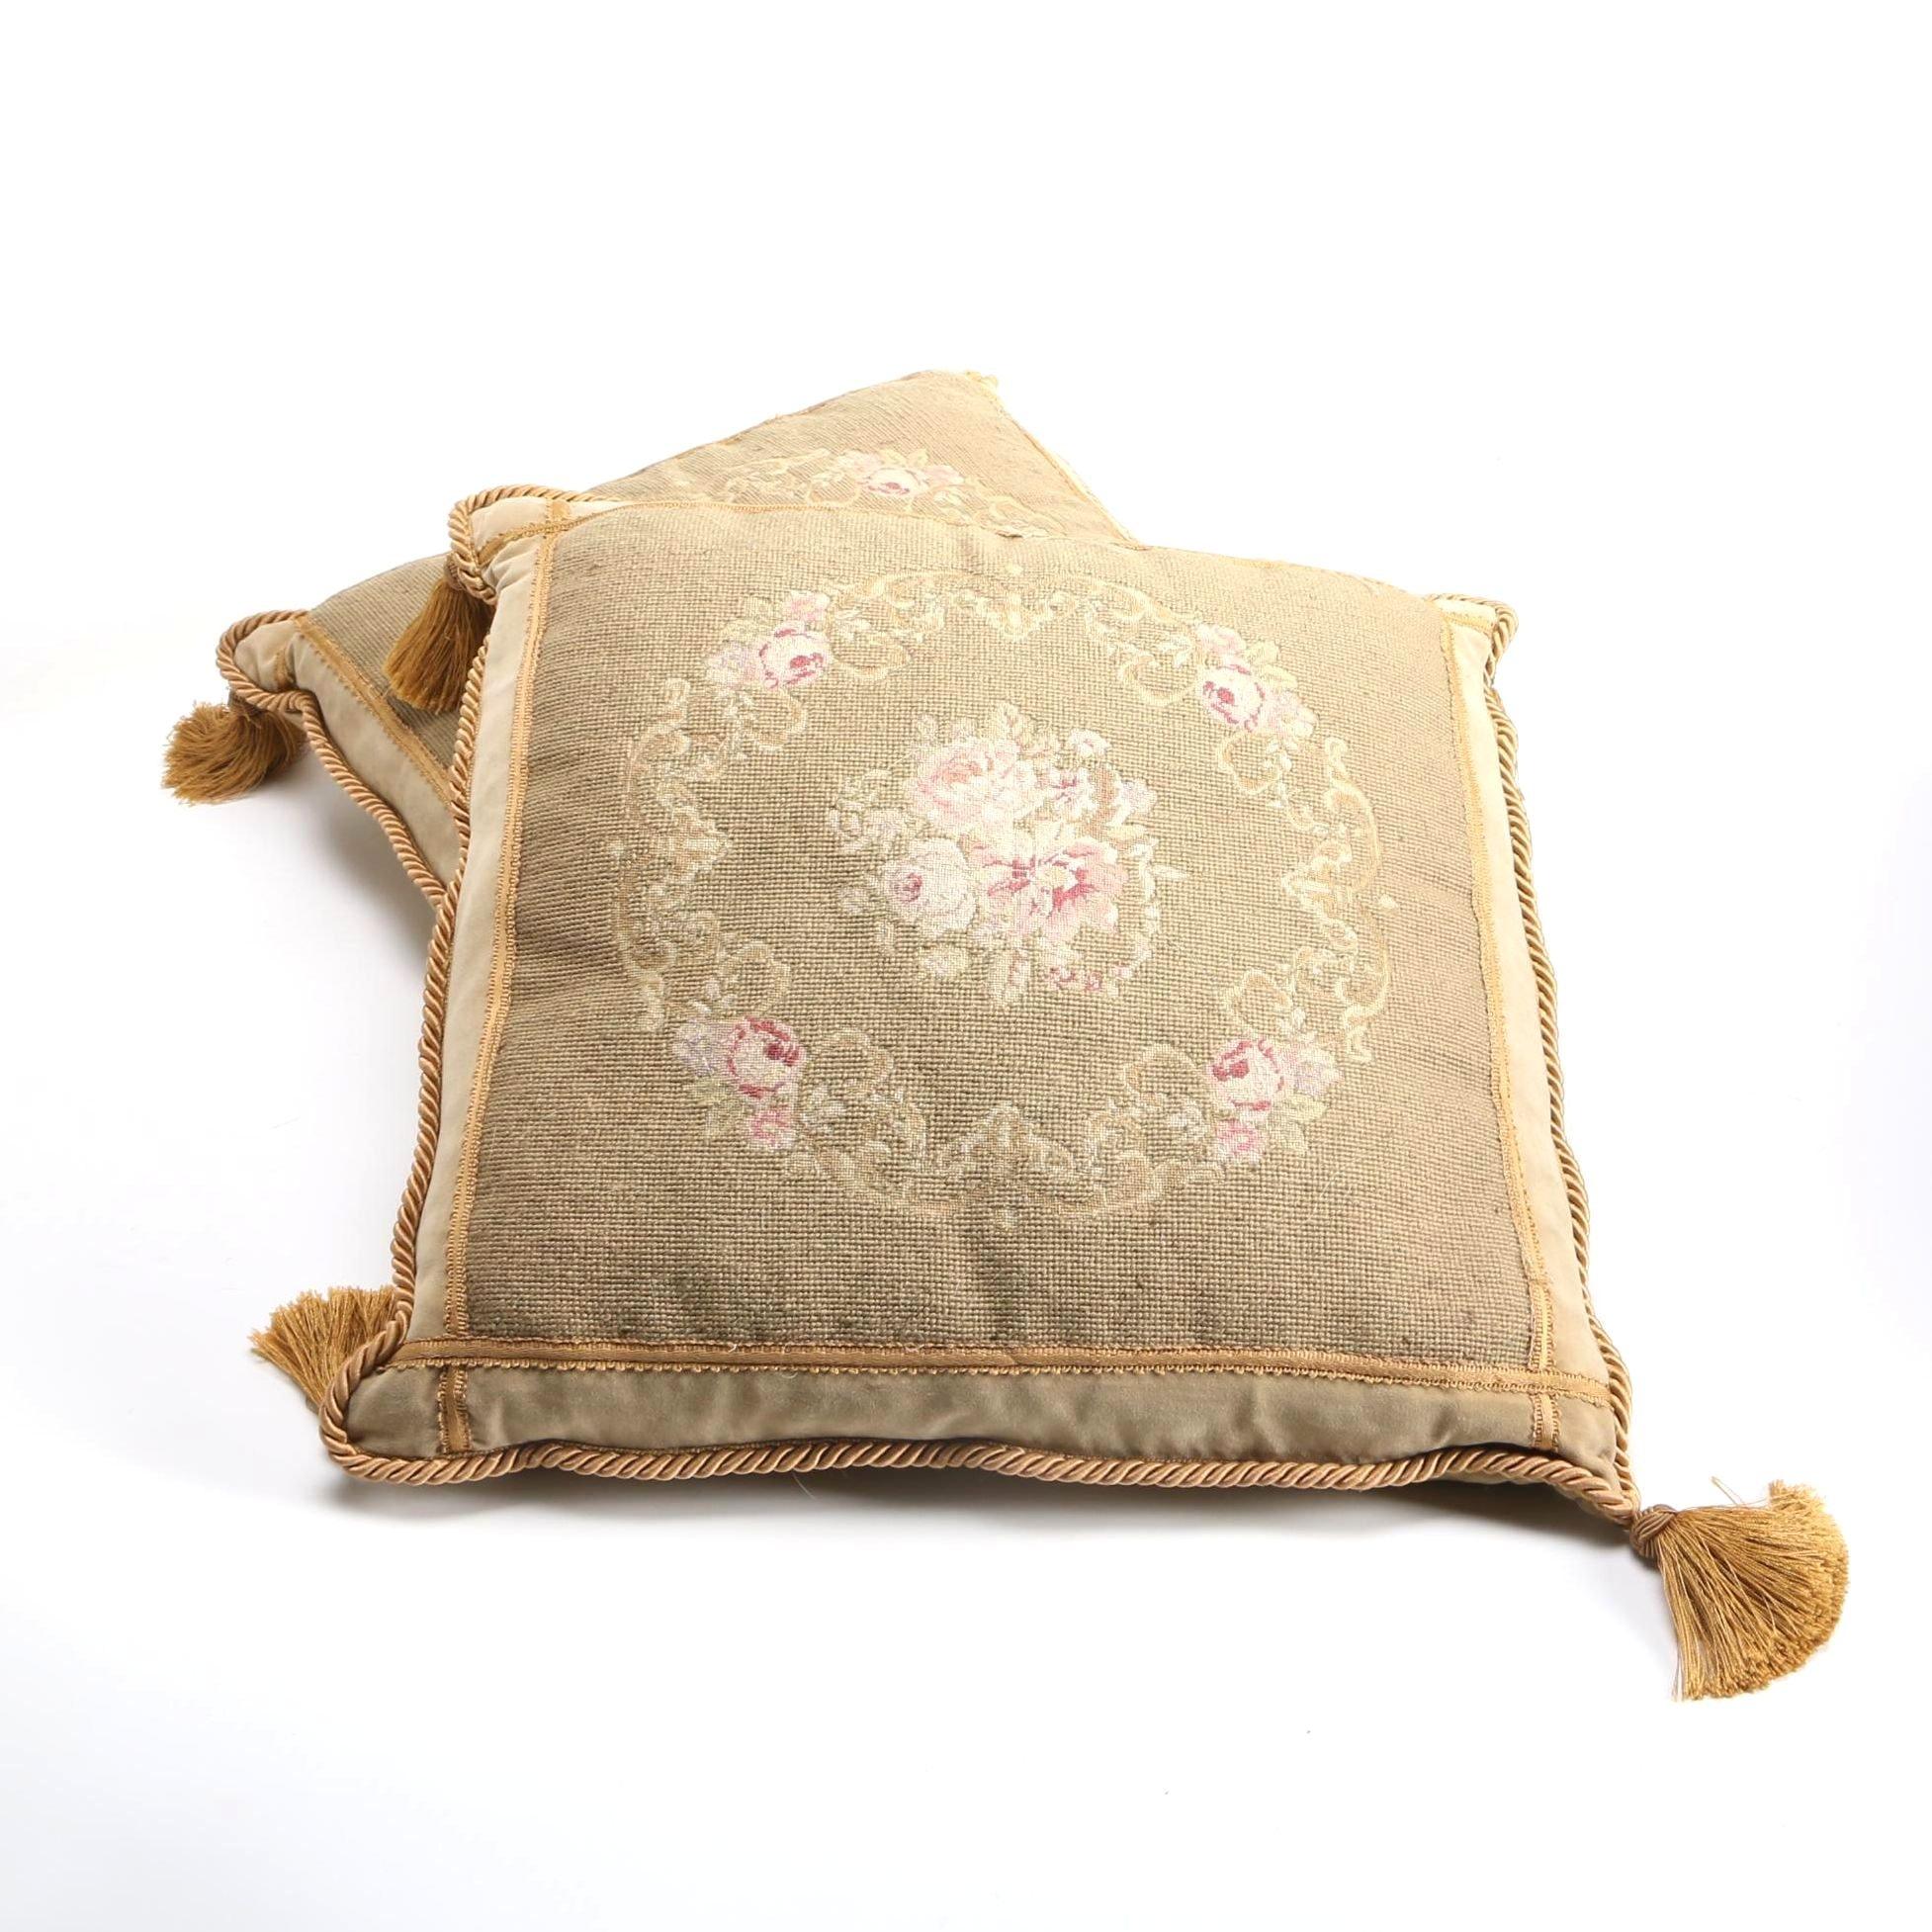 Pair of Vintage Needlepoint Pillows